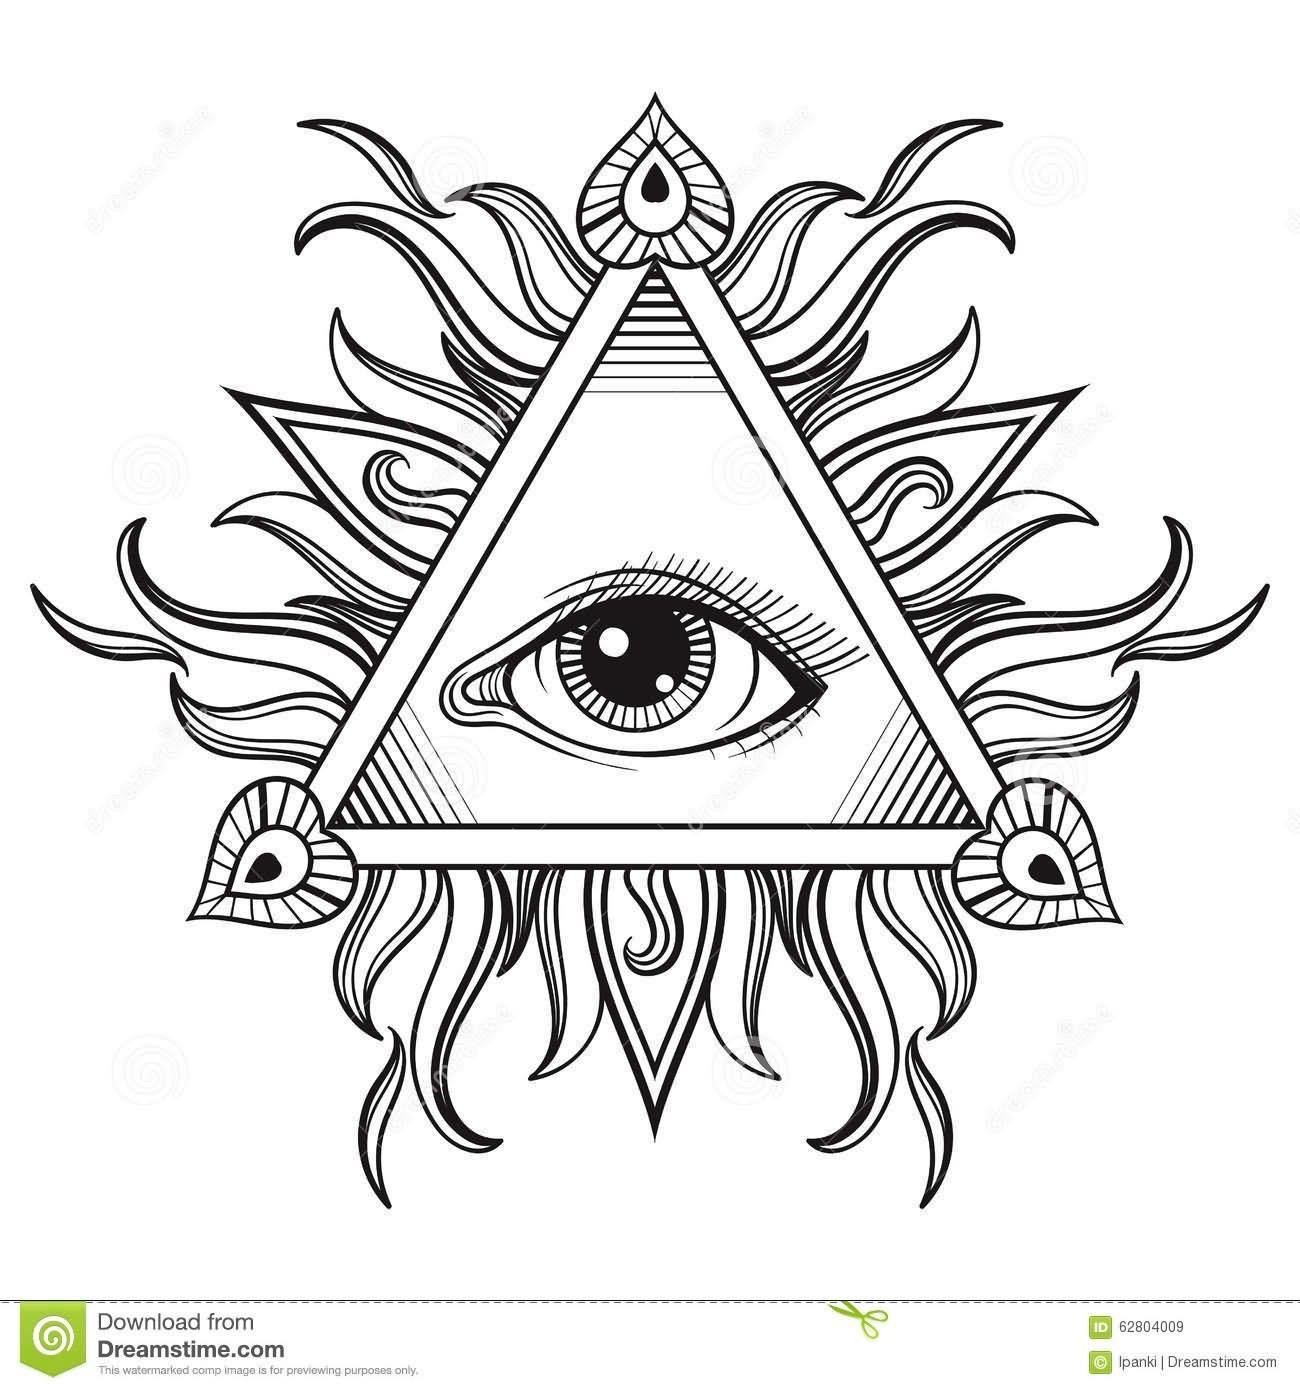 27 latest symbol tattoos designs ideas pyramid eye symbol tattoo design biocorpaavc Images